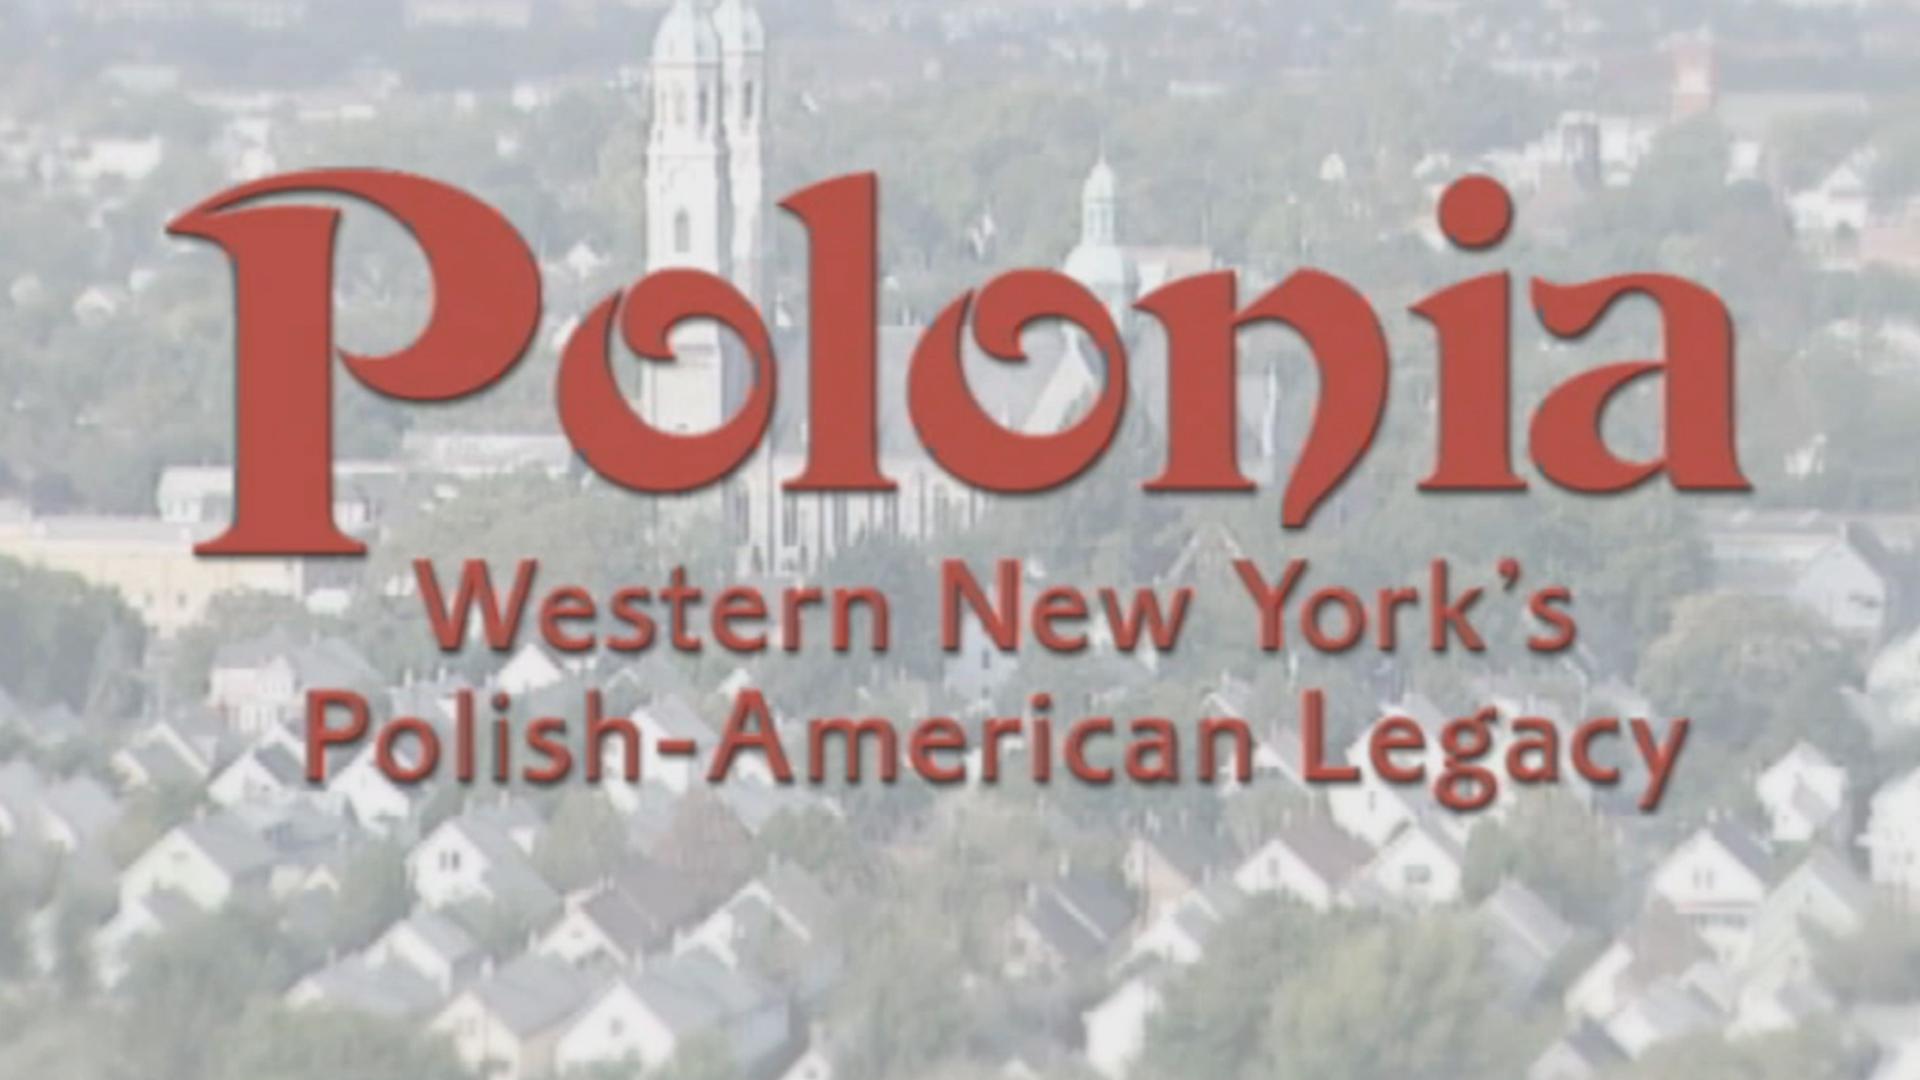 Polonia: Western New York's Polish - American Legacy